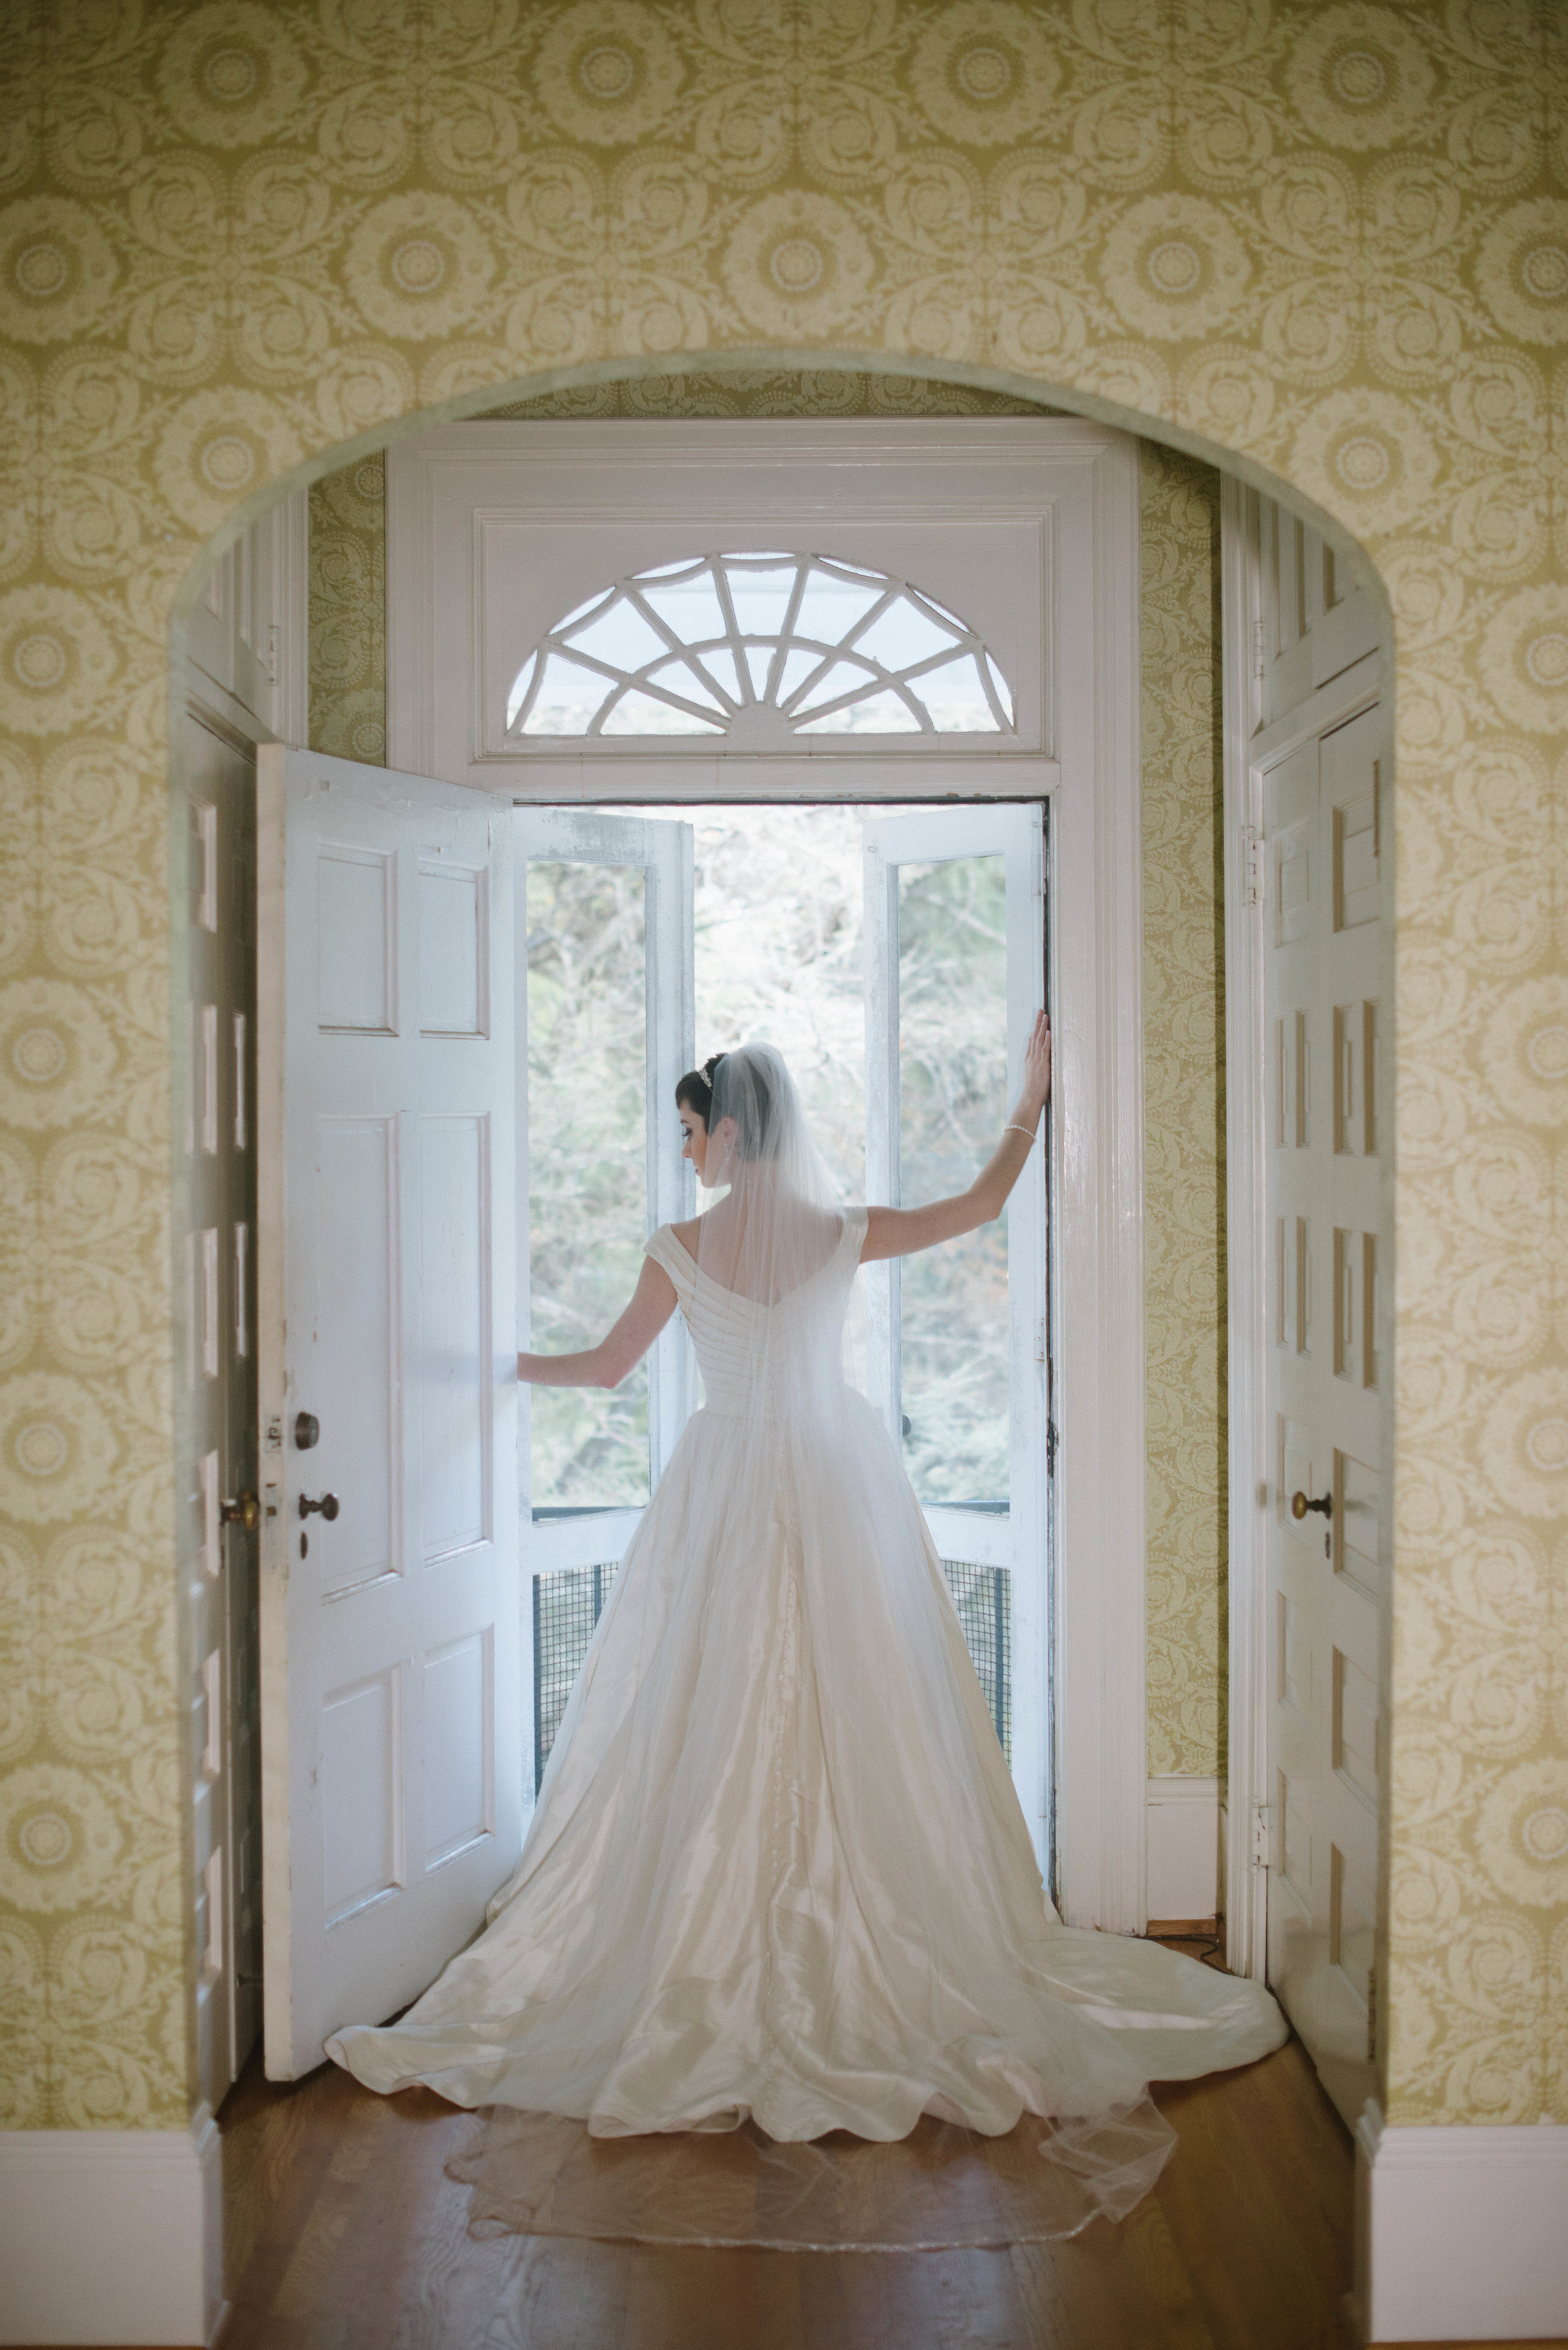 CarolineMerritt|Bridals|_Color_MiraPhotographs-125.jpg